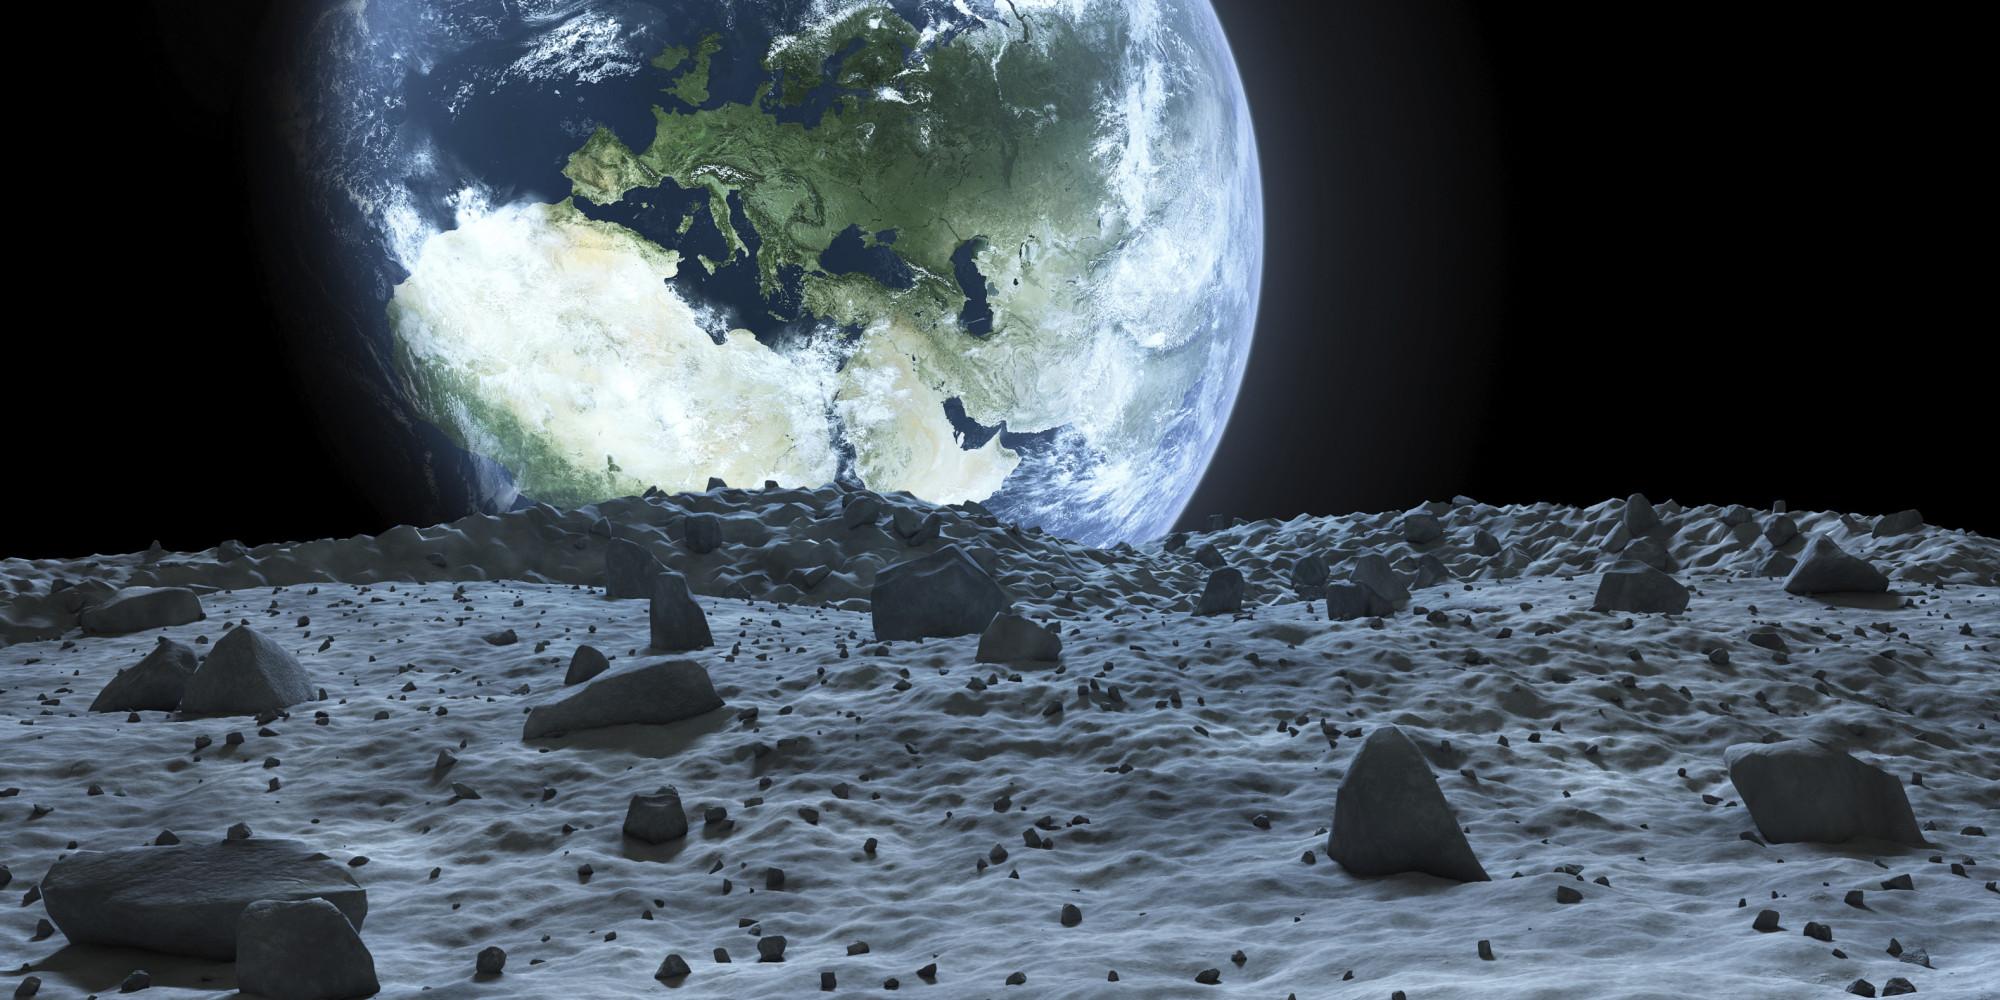 project horizon moon base documents - photo #25